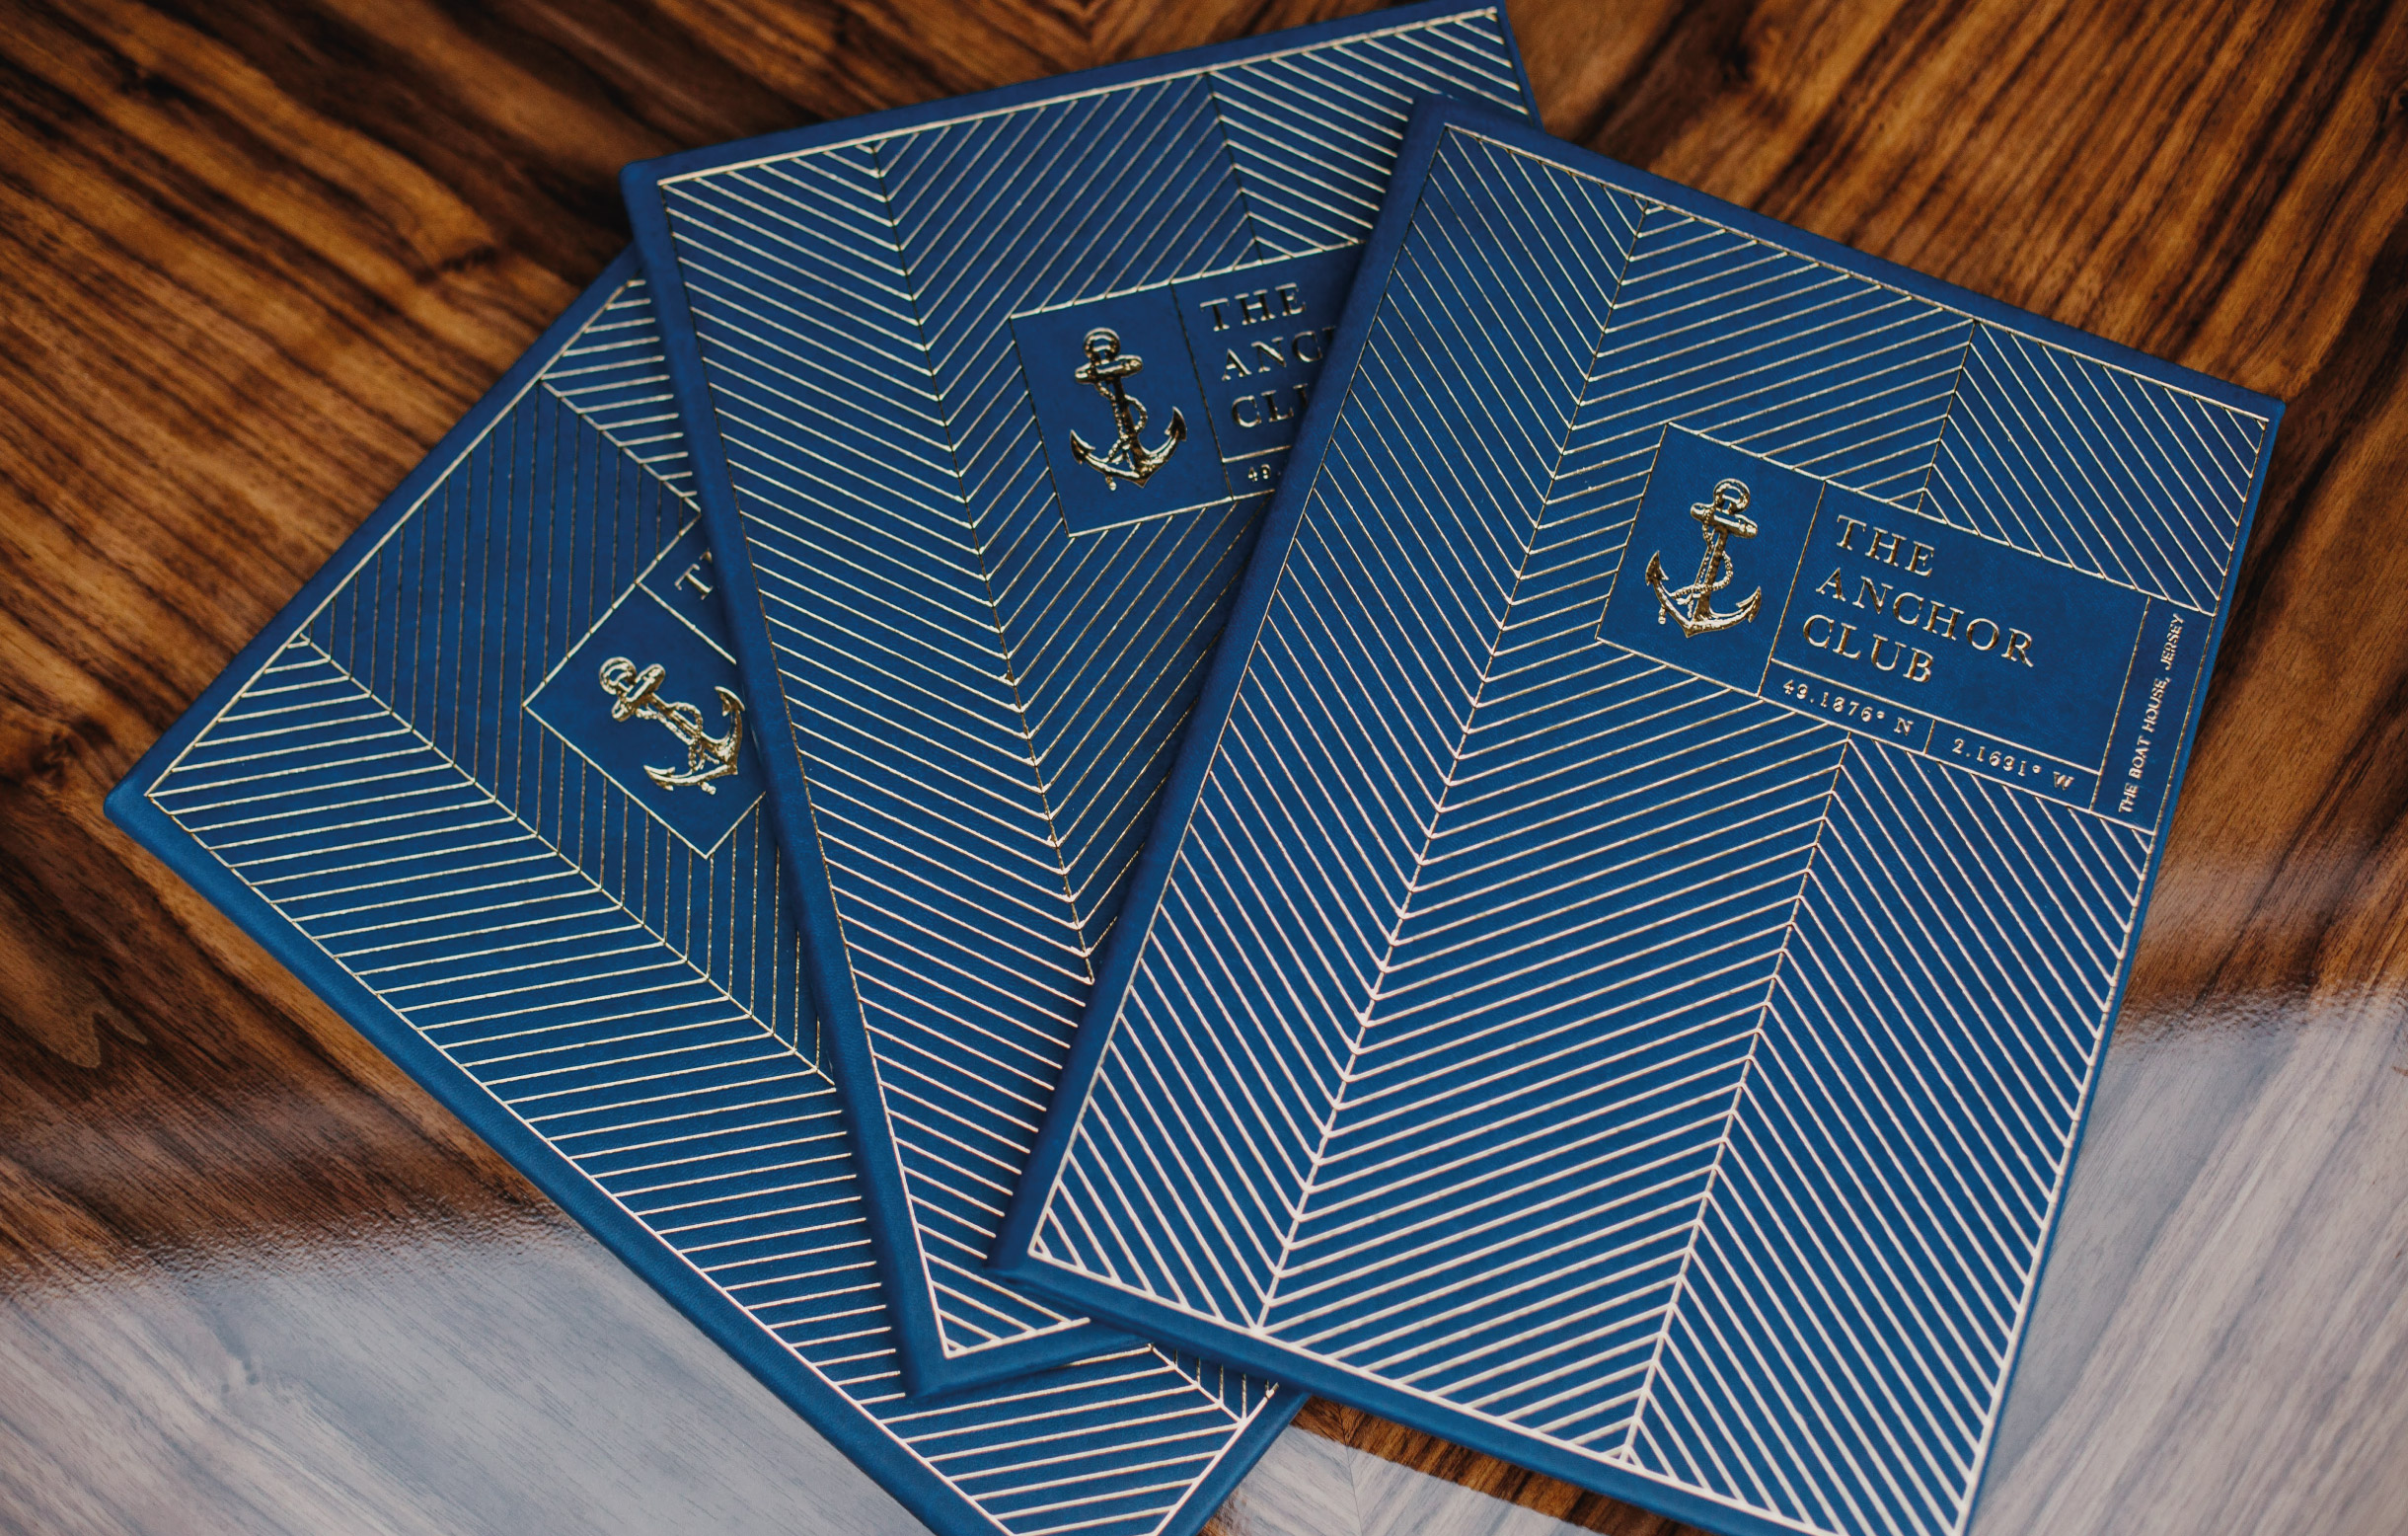 Quints Design co - The Anchor Club - Branding and Menu Design